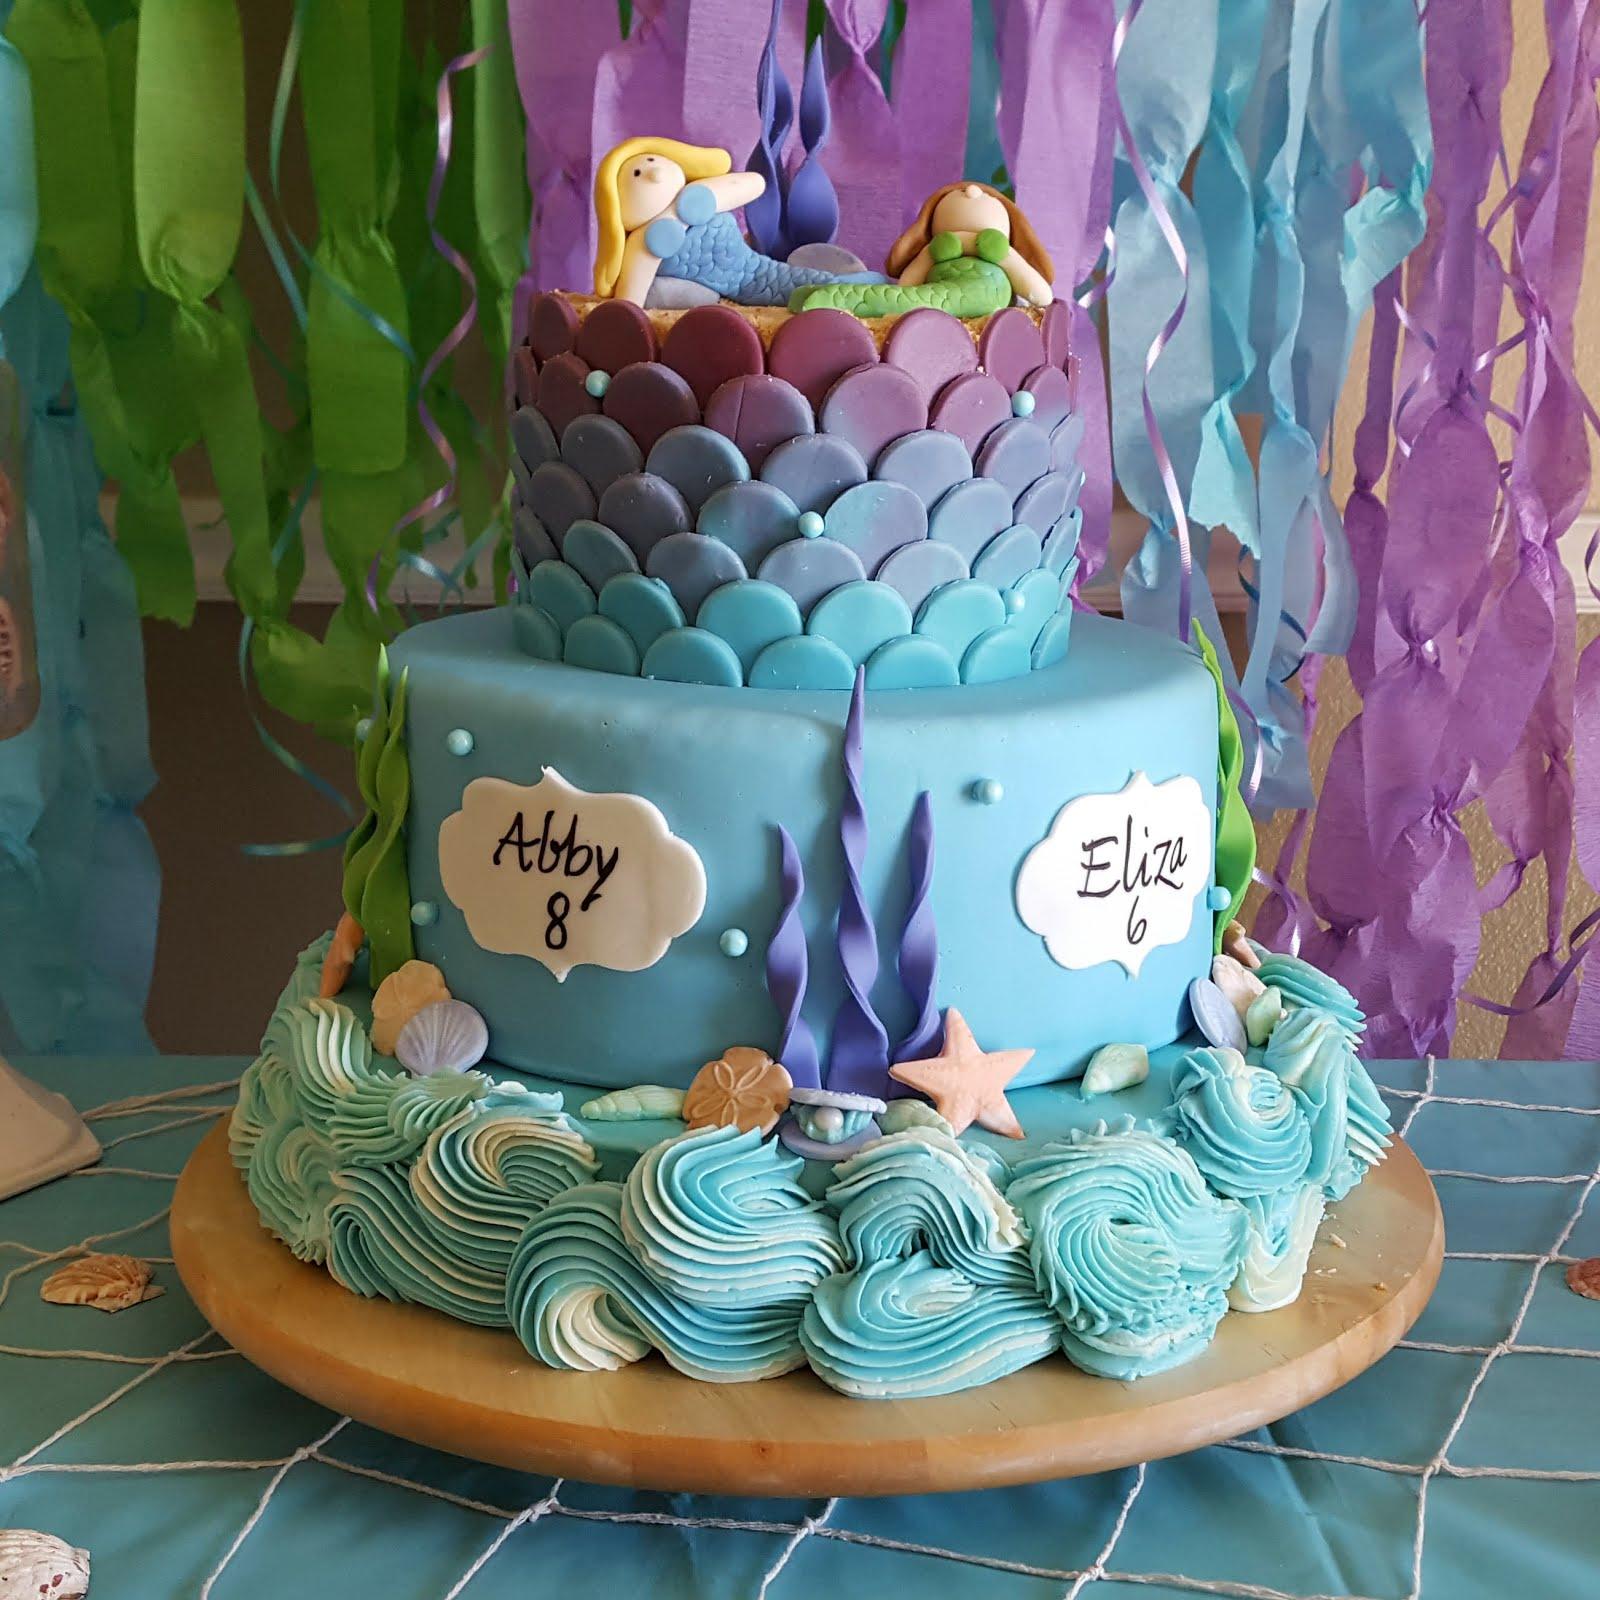 Patty Cakes Bakery September 2013